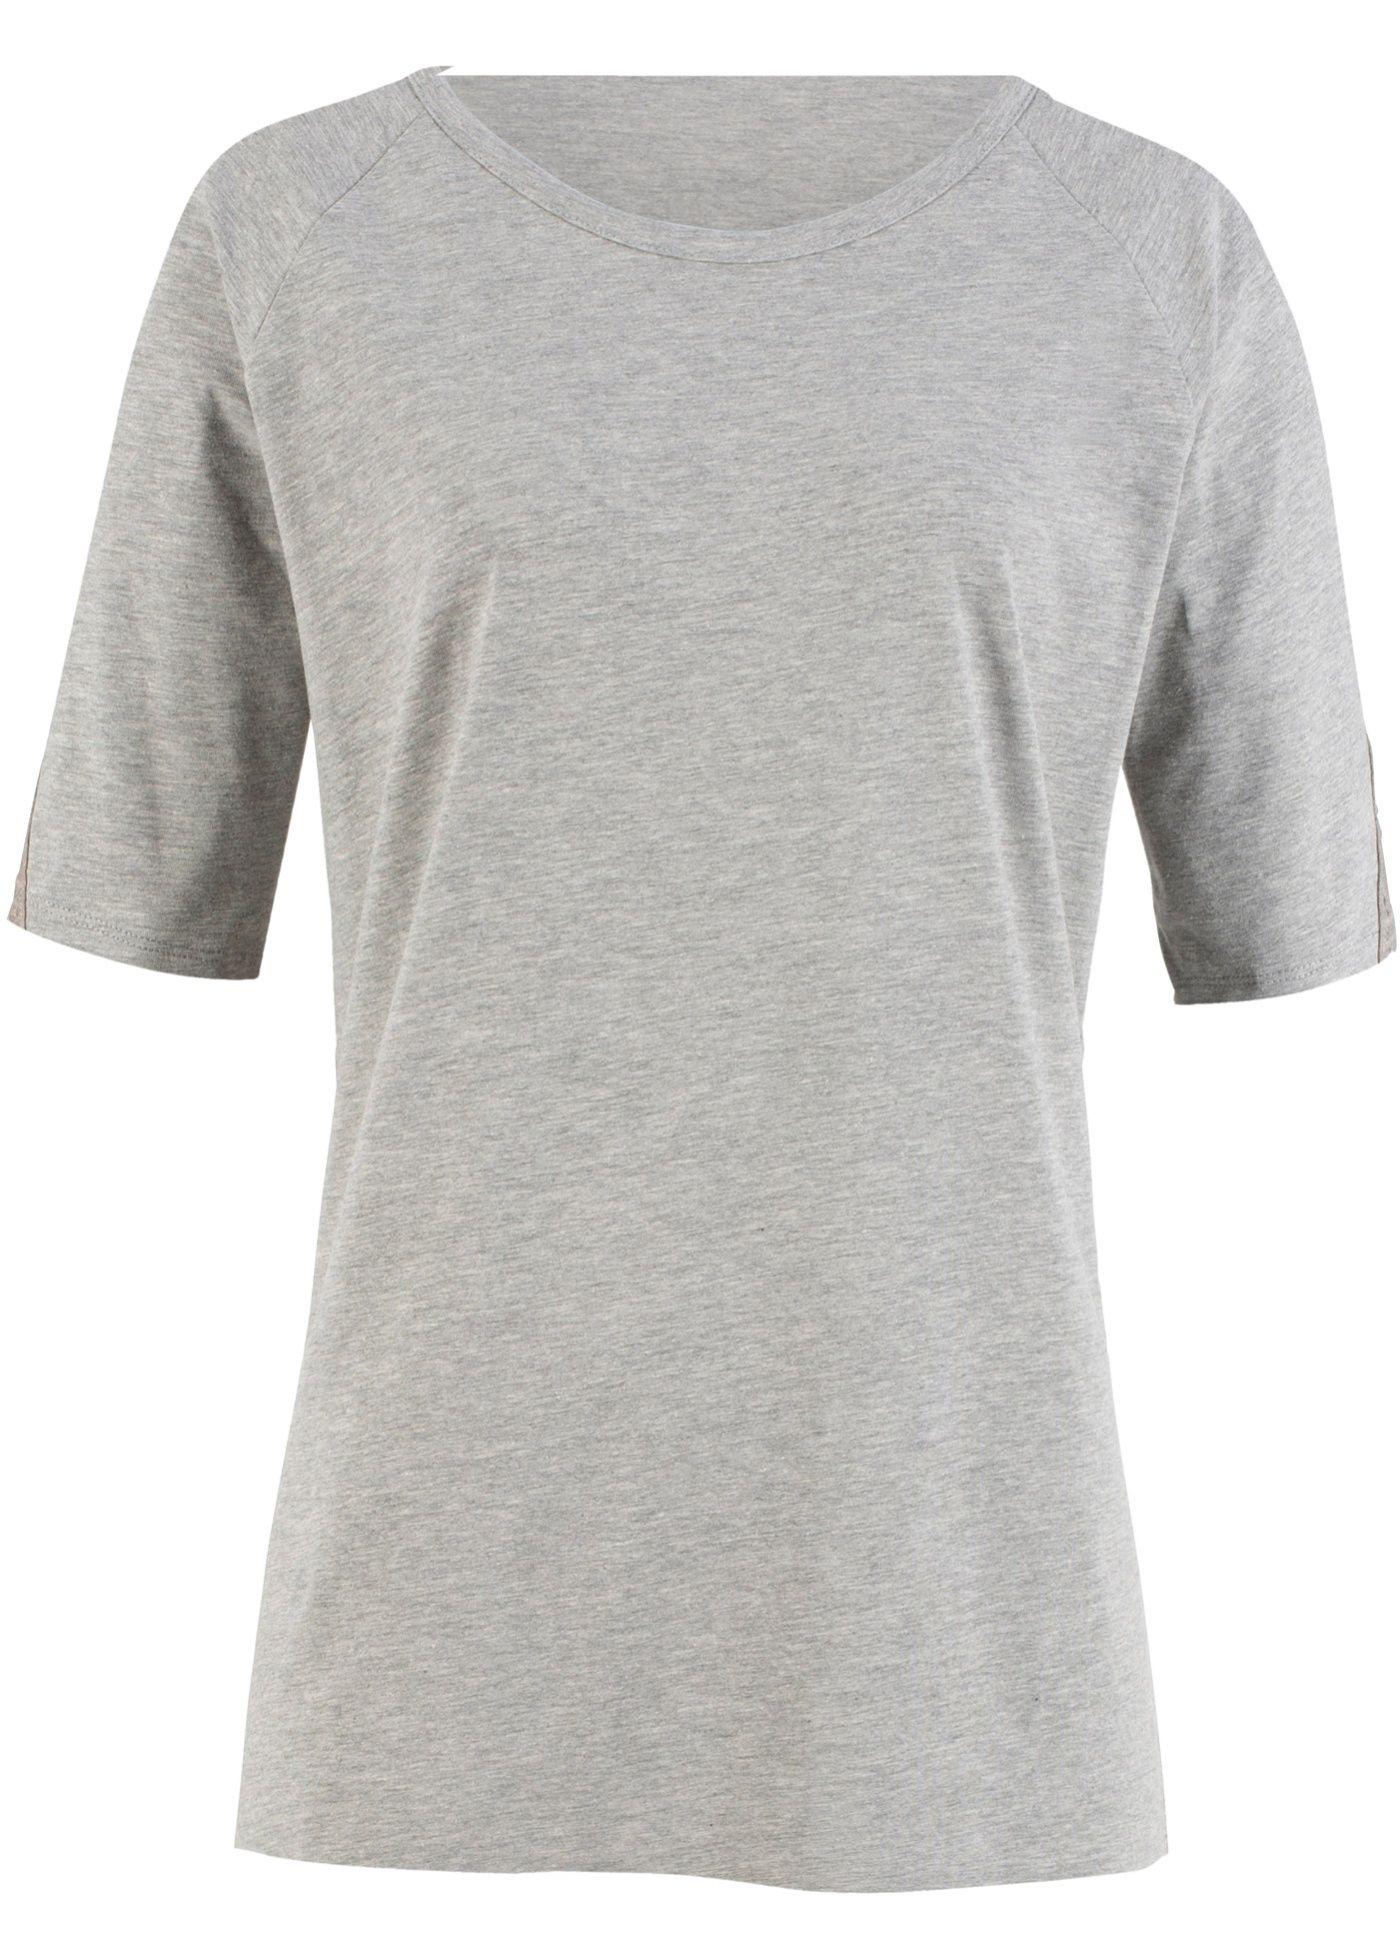 T Shirt Mit Spitzeneinsatz Am Armel In 2020 T Shirt Shirts Kurze Kleider